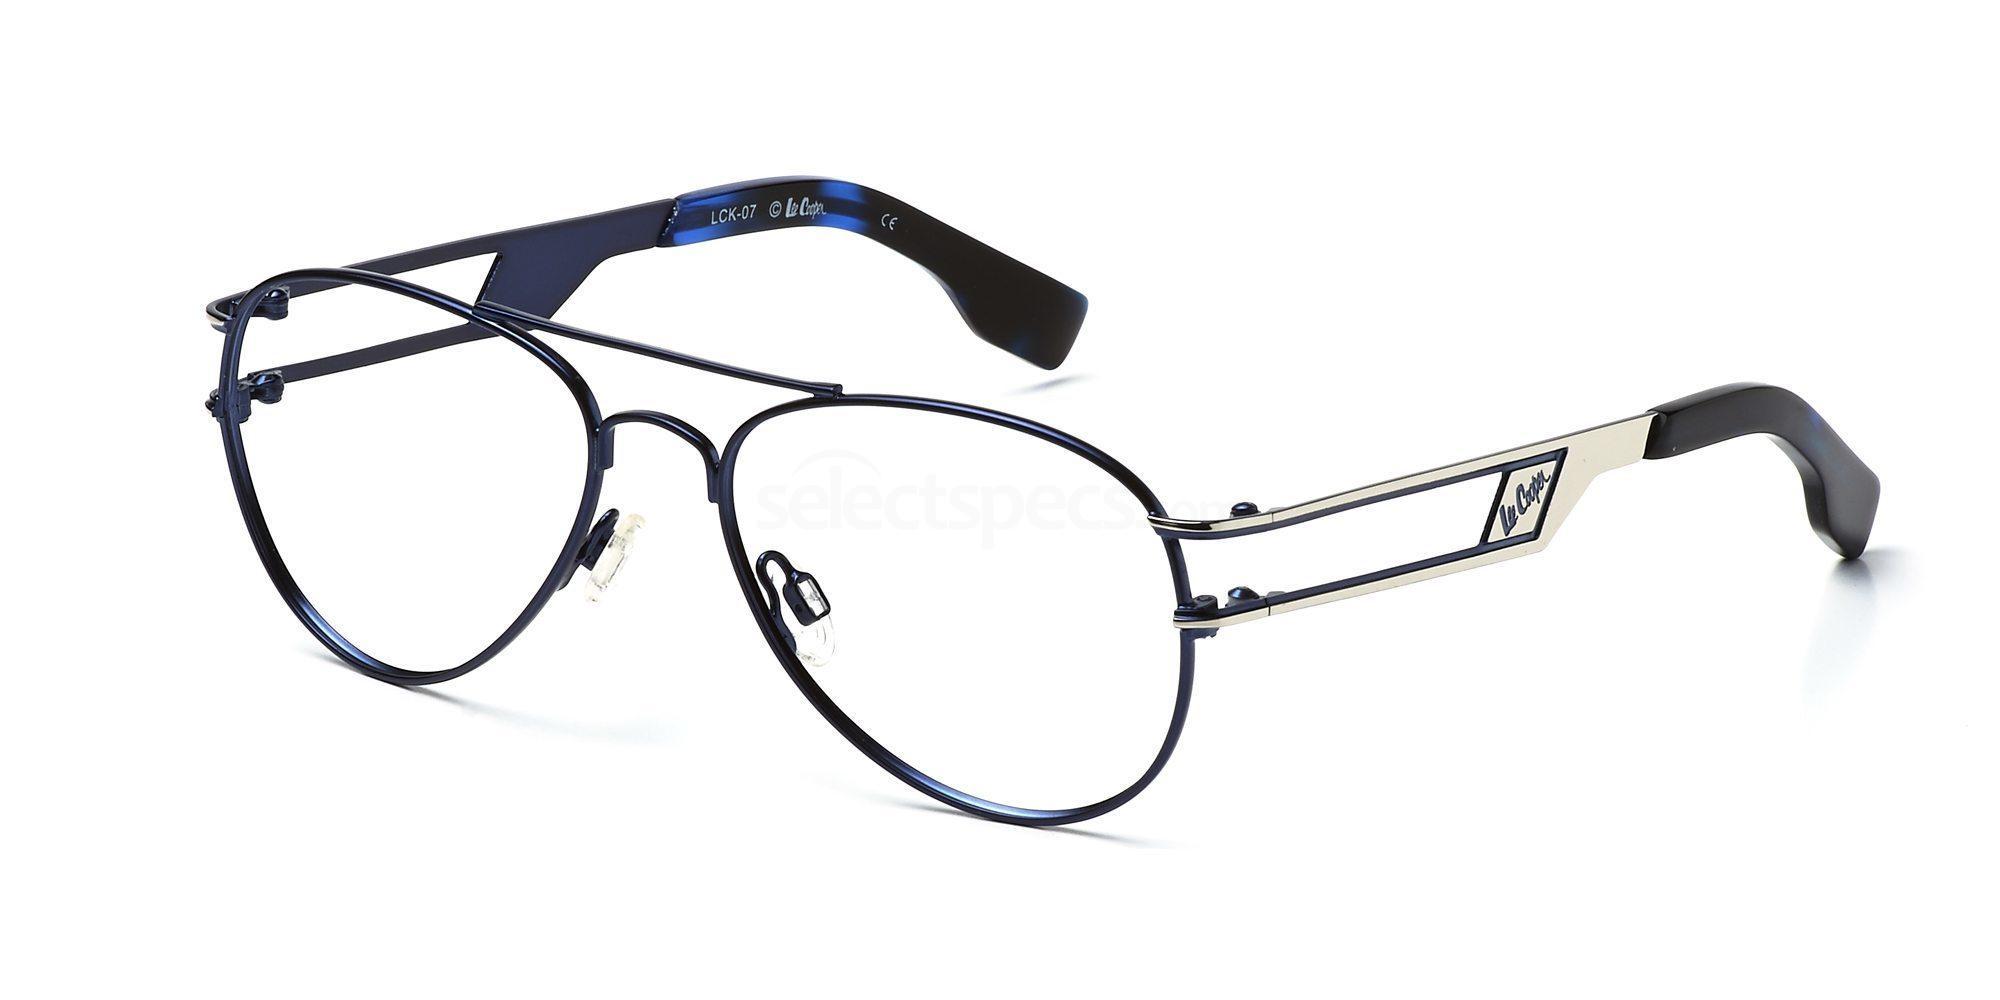 C2 LCK07 Glasses, Lee Cooper KIDS